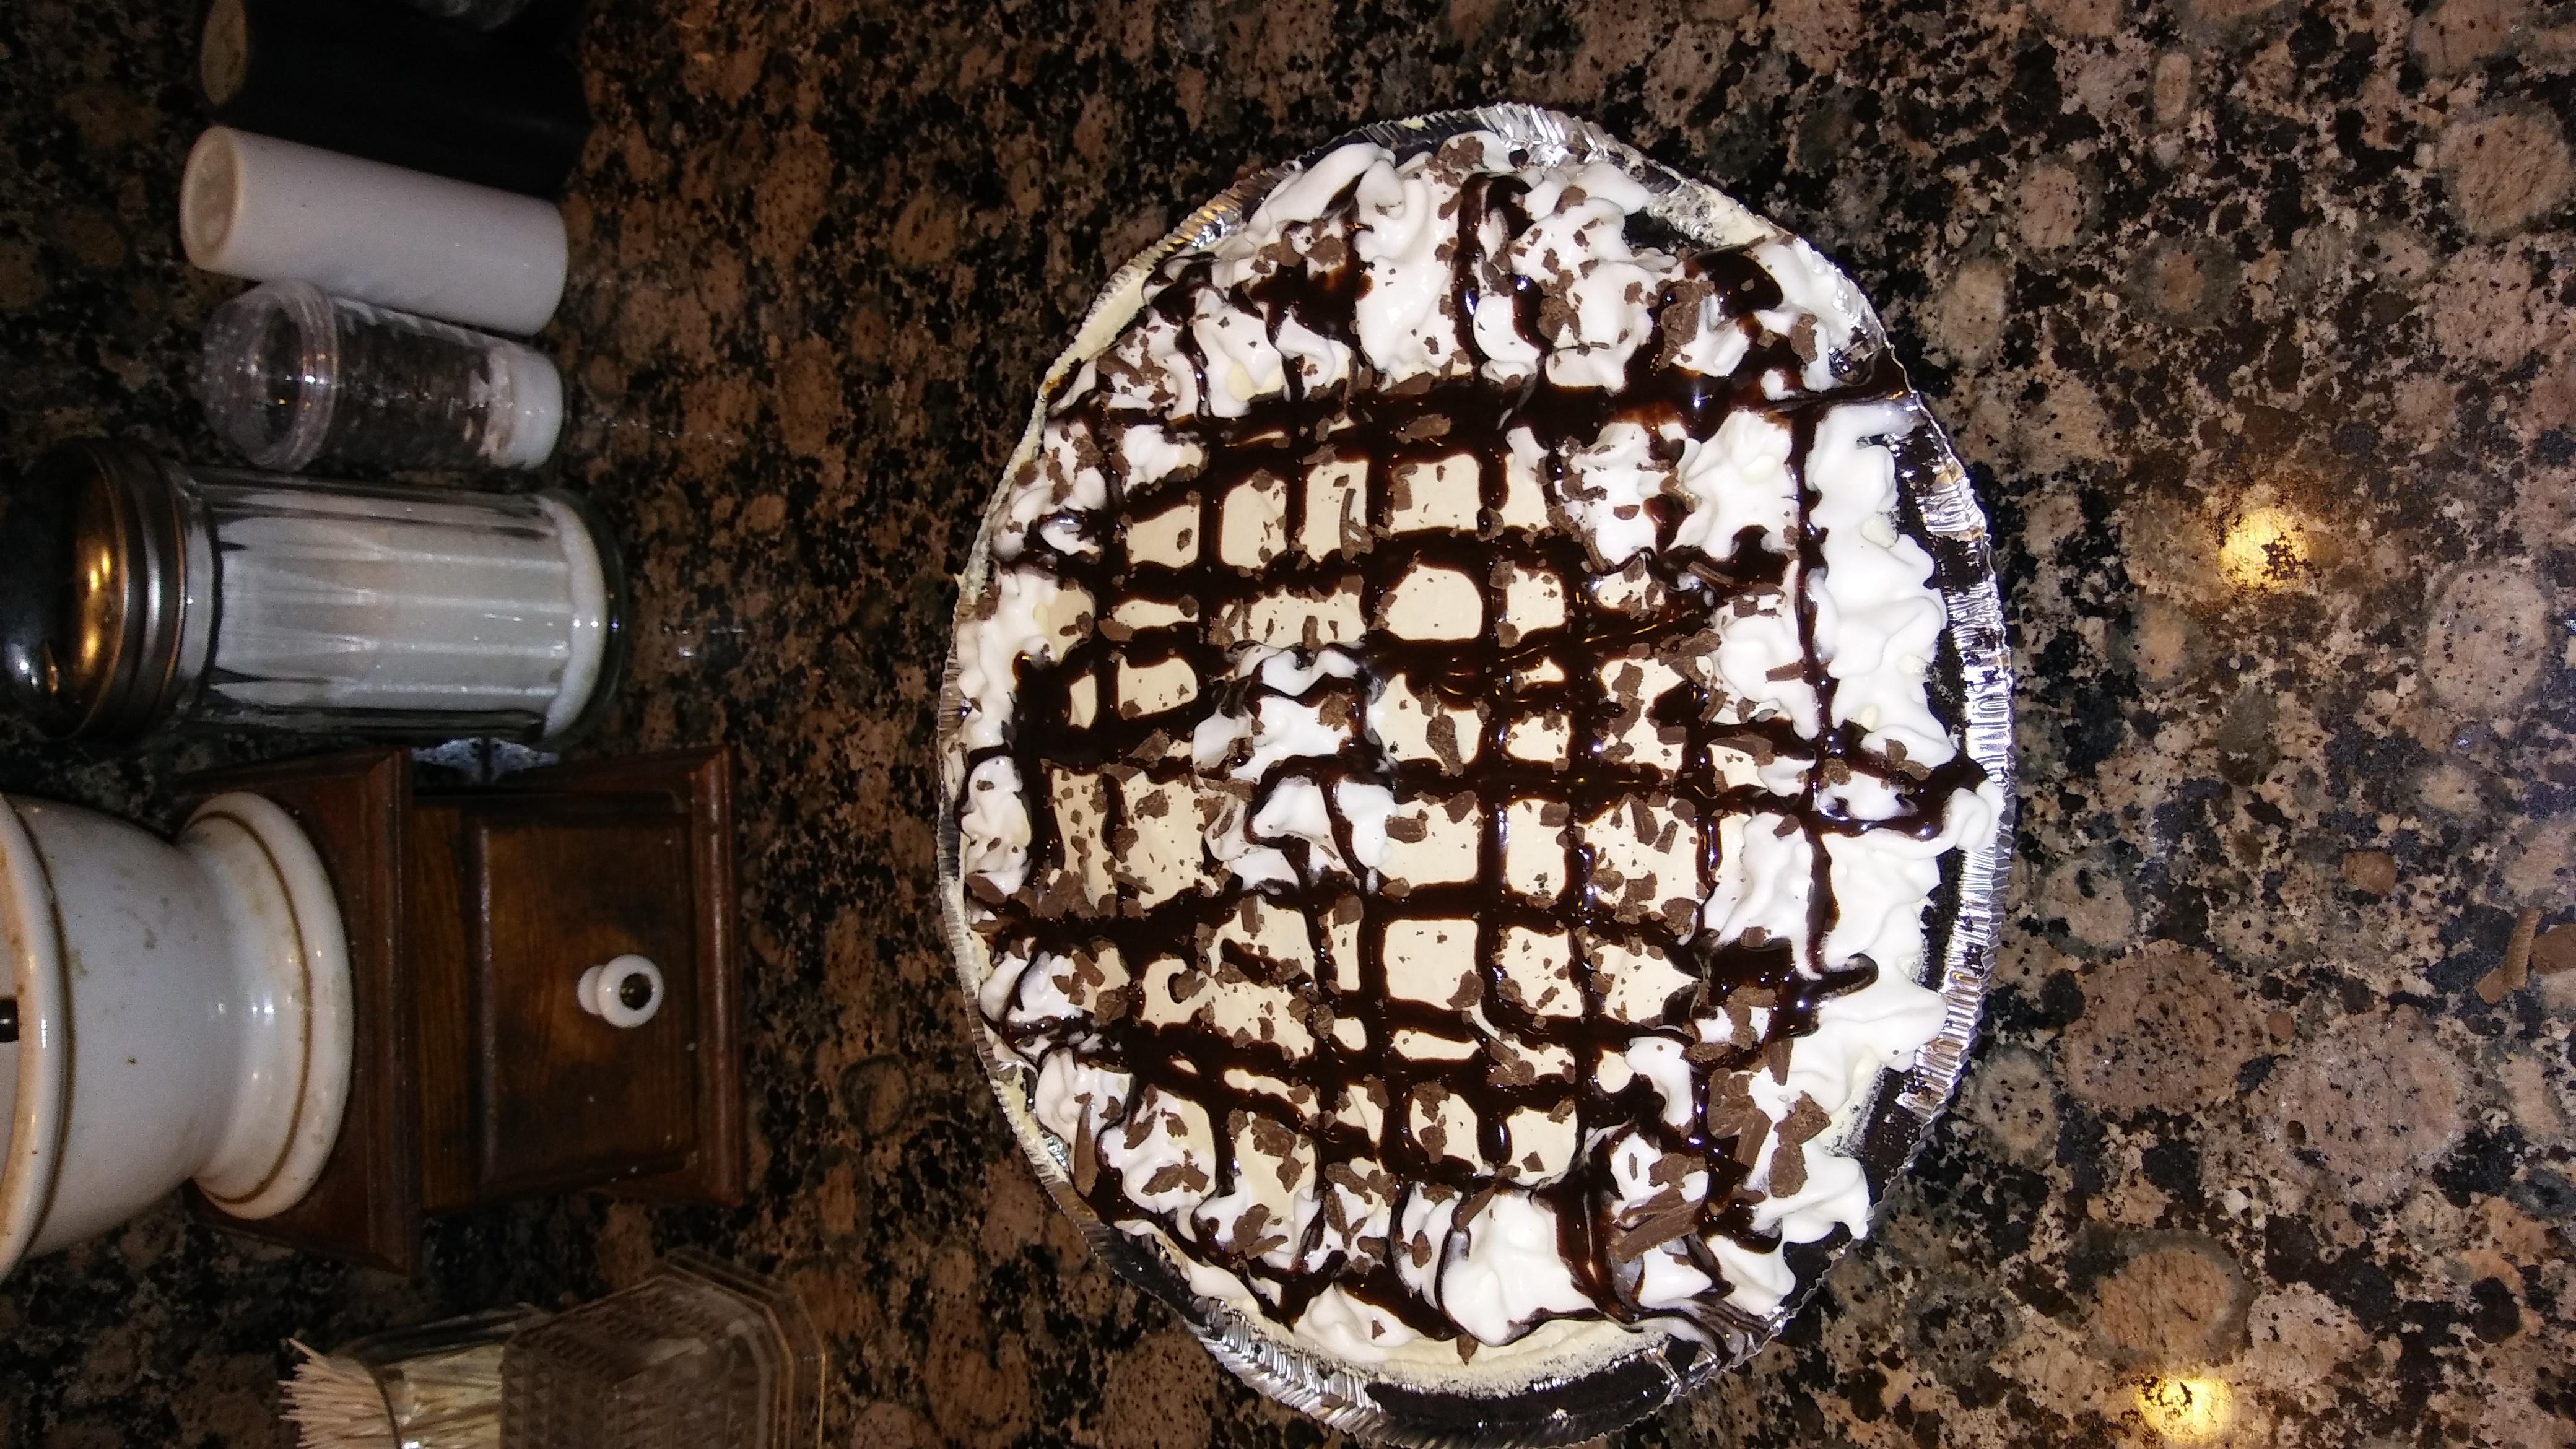 No Bake Peanut Butter Pie Charles Fiske